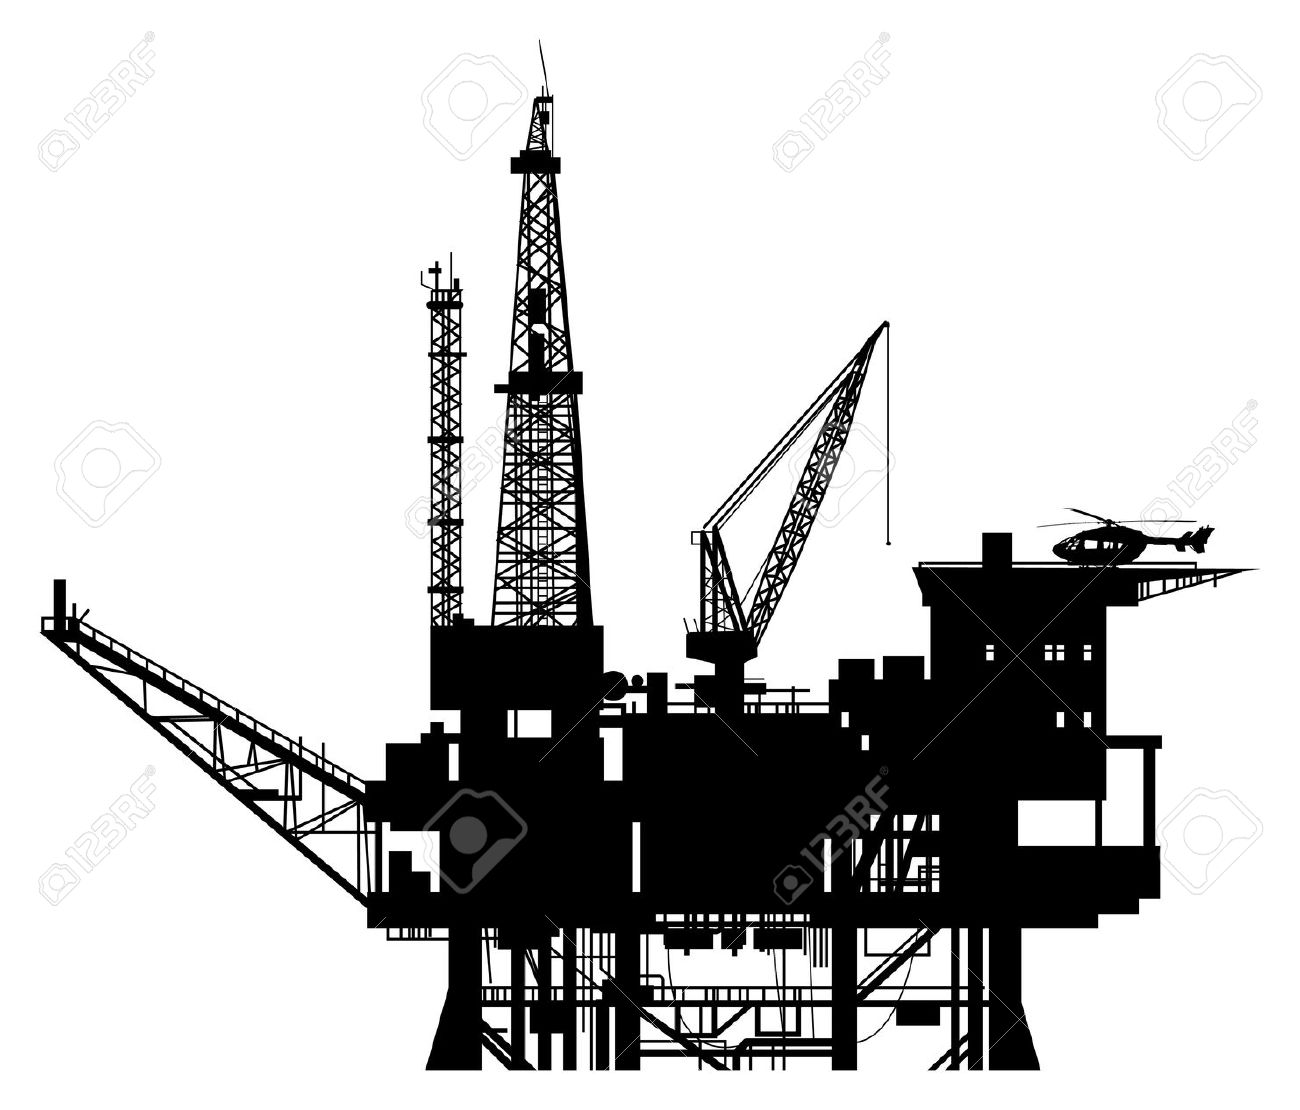 Oil Rig Clipart & Oil Rig Clip Art Images.